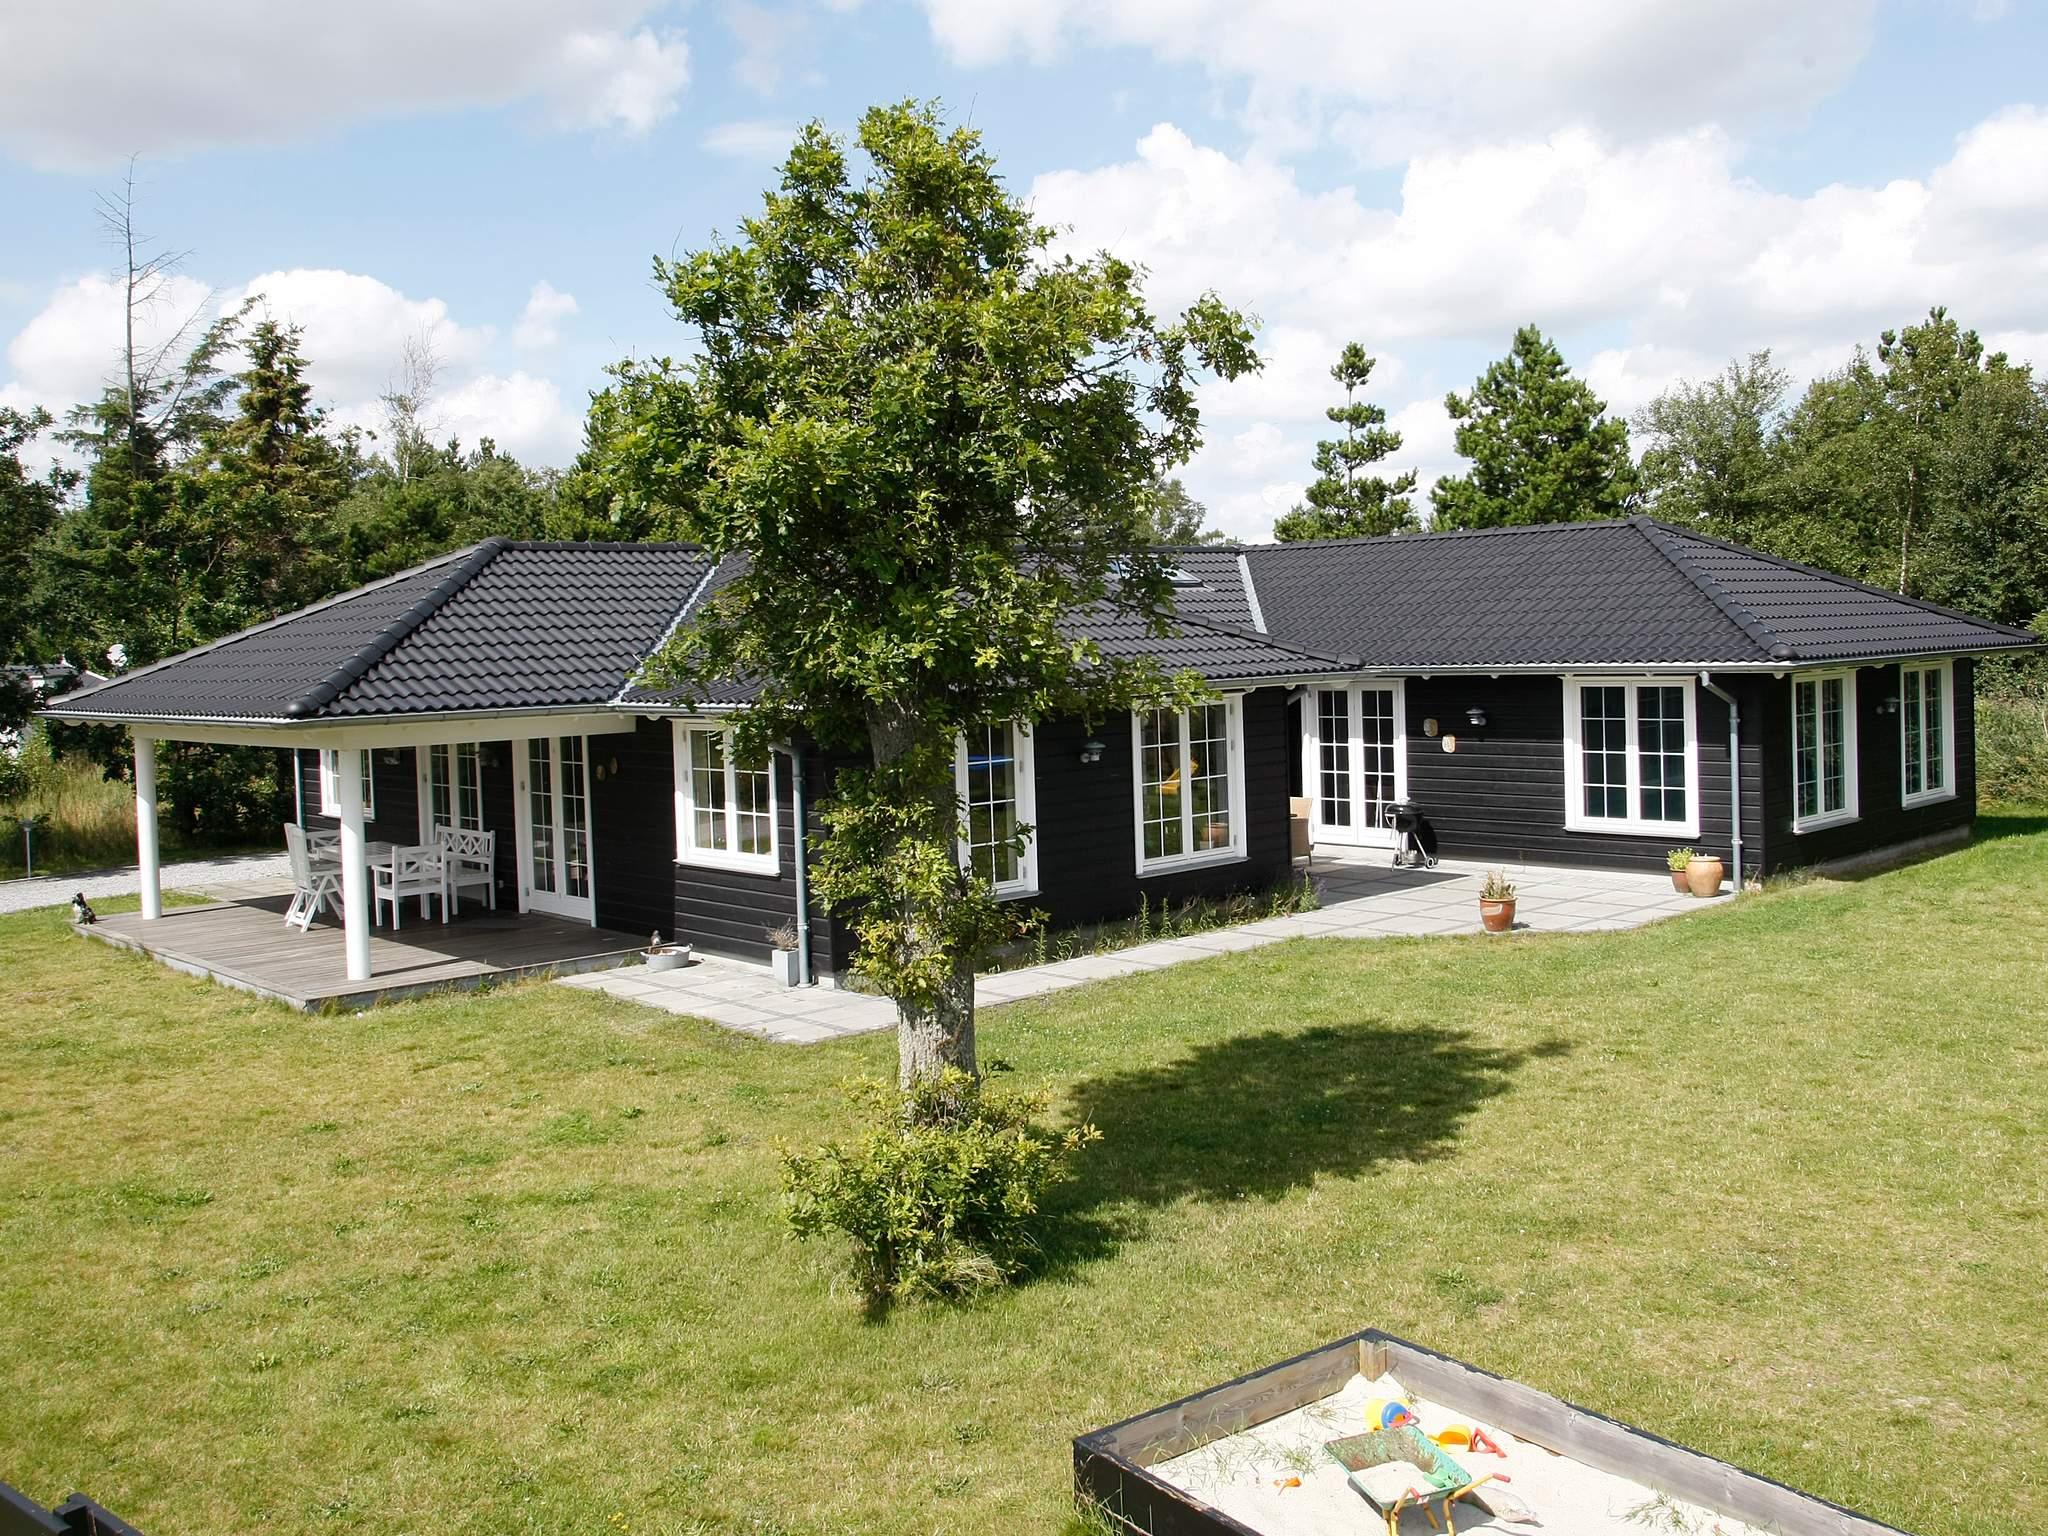 Ferienhaus Hou/Lagunen (317346), Hou, , Dänische Ostsee, Dänemark, Bild 22